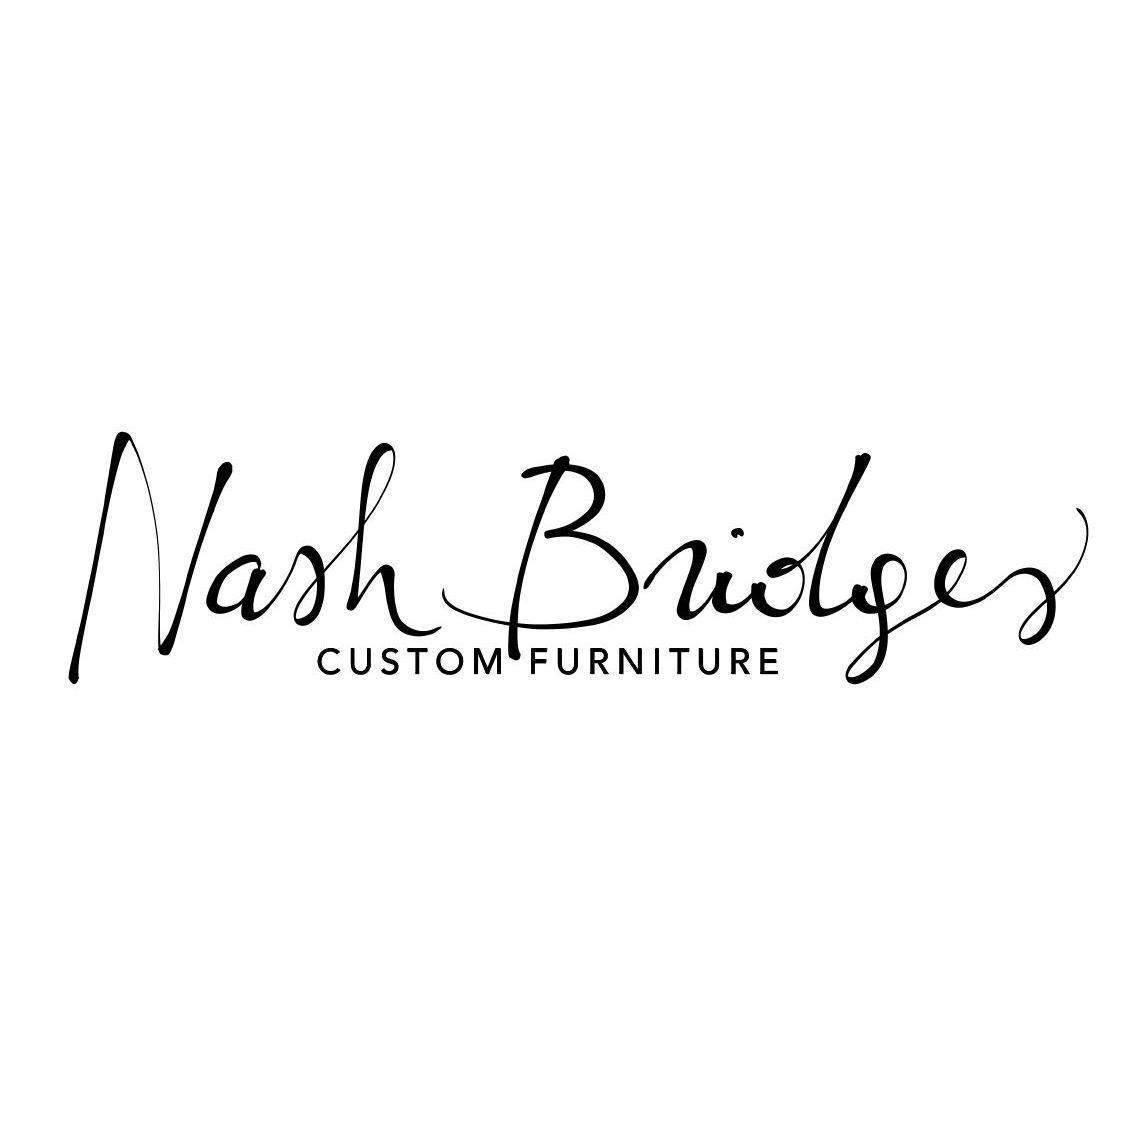 Nash Bridges Custom Furniture - Bristol, Gloucestershire BS34 7LQ - 07563 937282 | ShowMeLocal.com